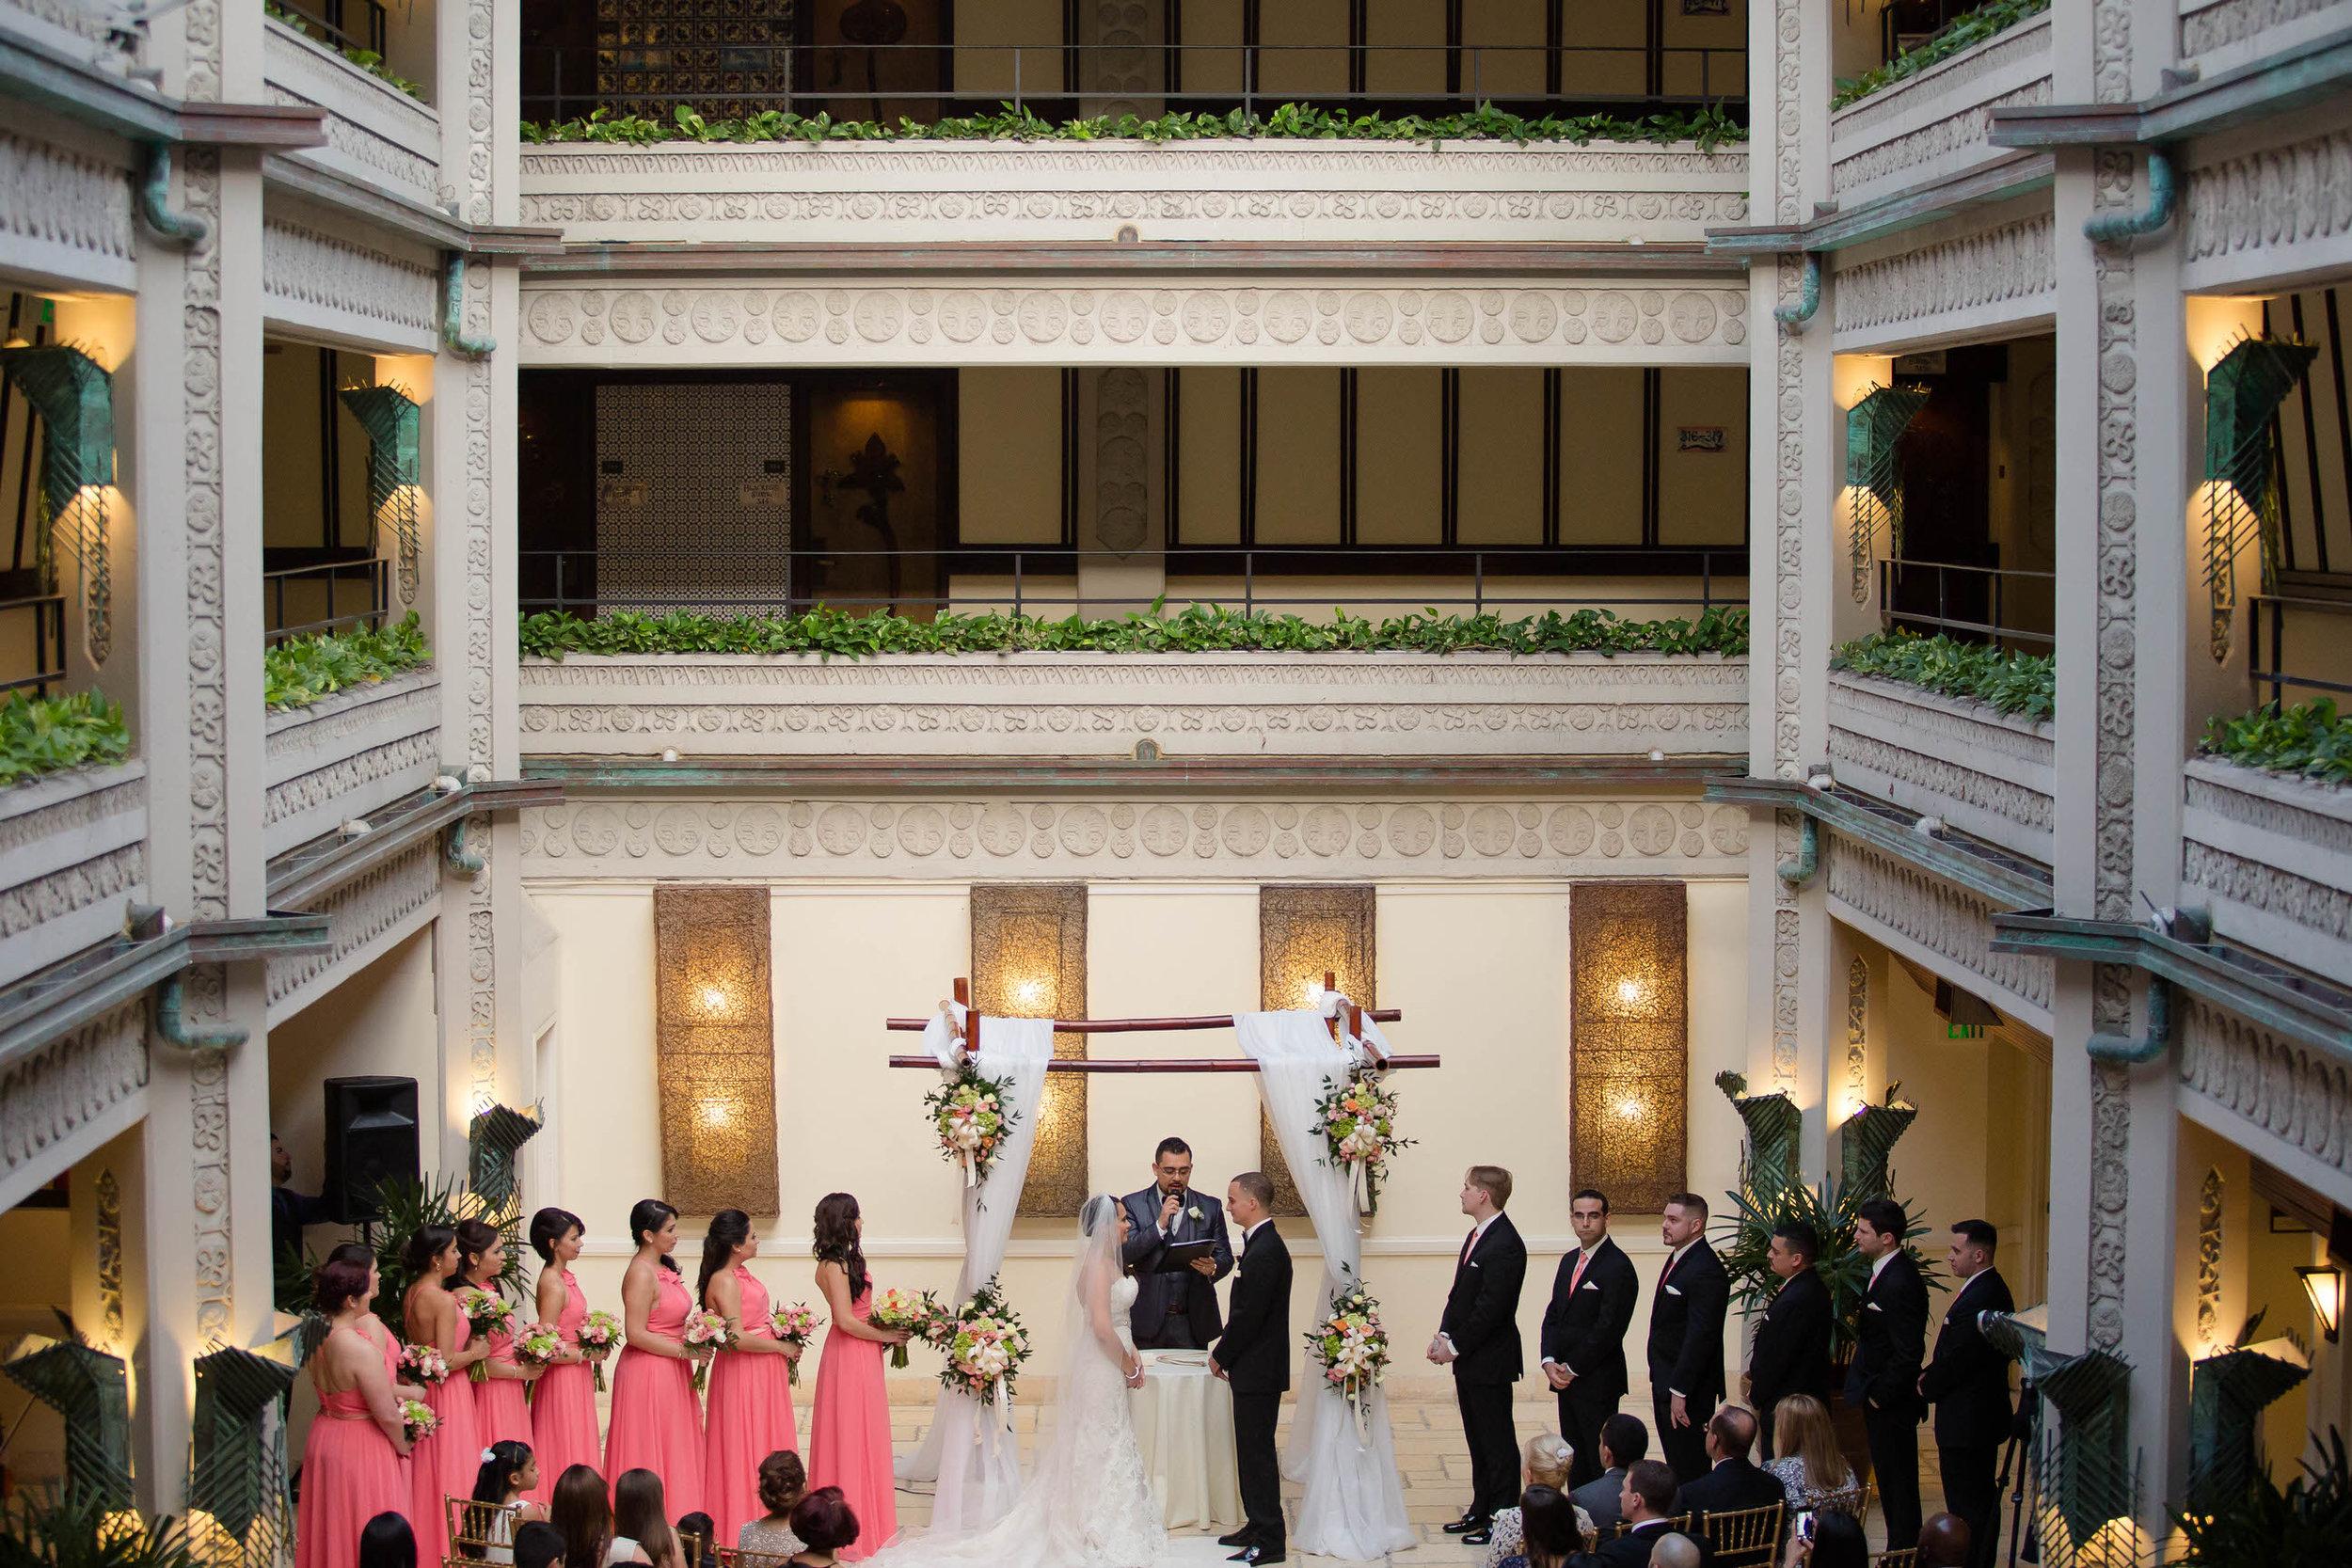 celebrity-wedding-photographer-miami-tiny-house-photo.jpg